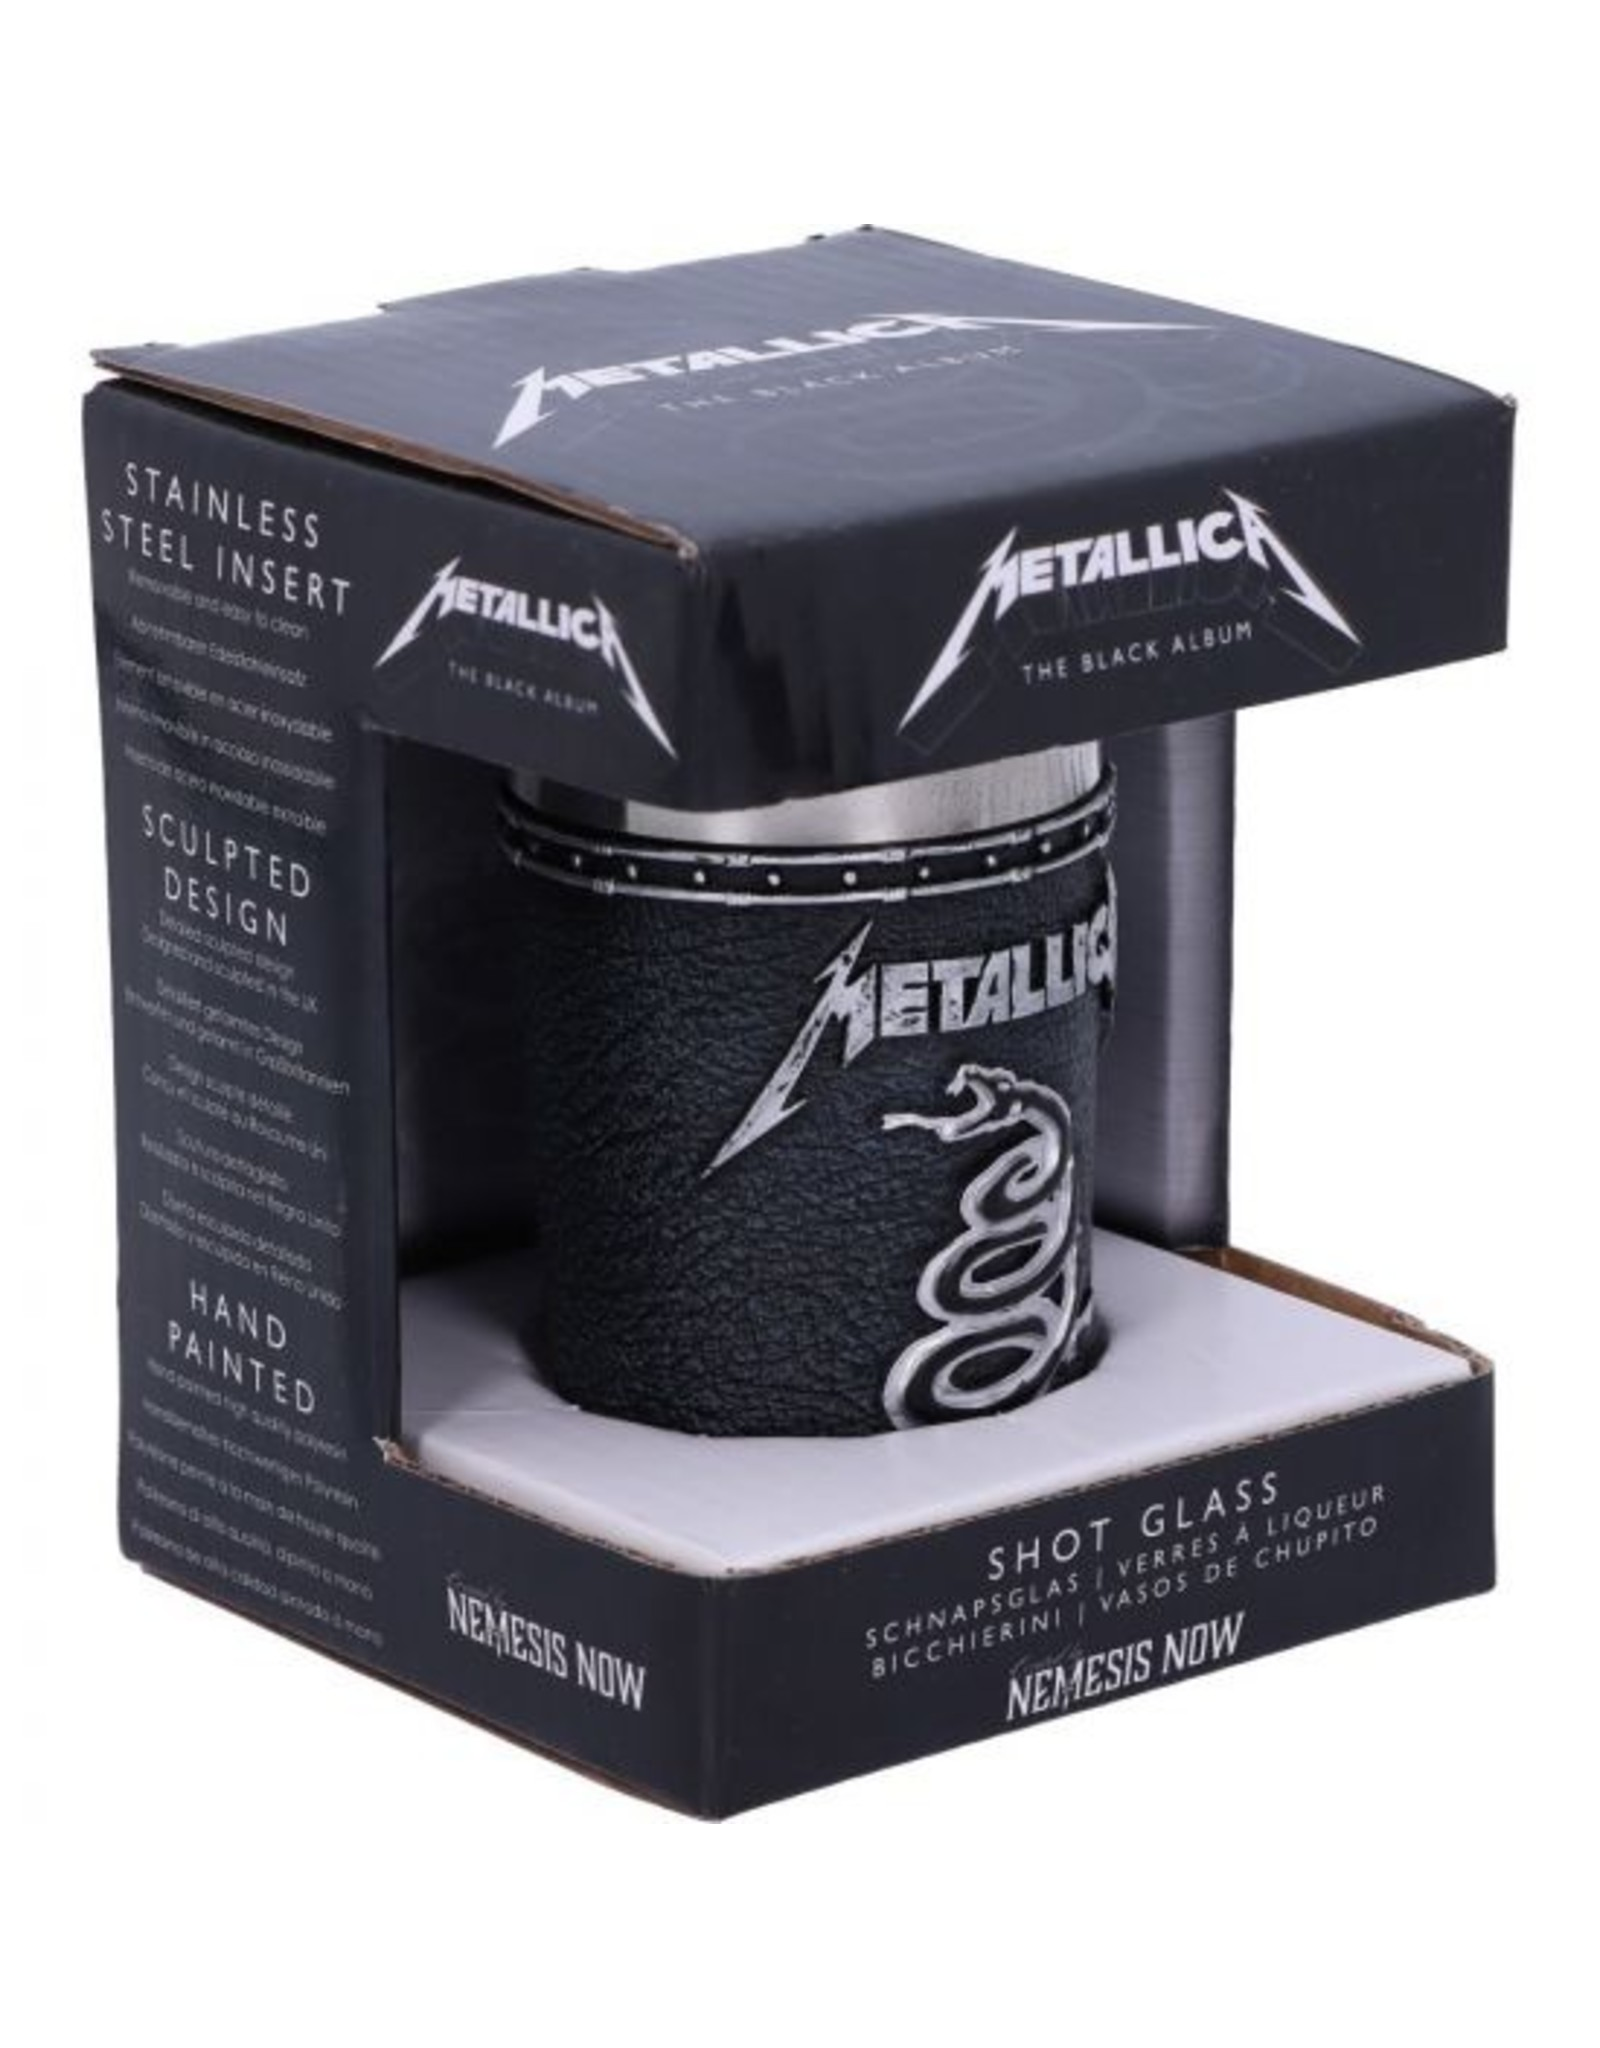 Metallica Metallica Schnapsbecher The Black Album 7,5 cm